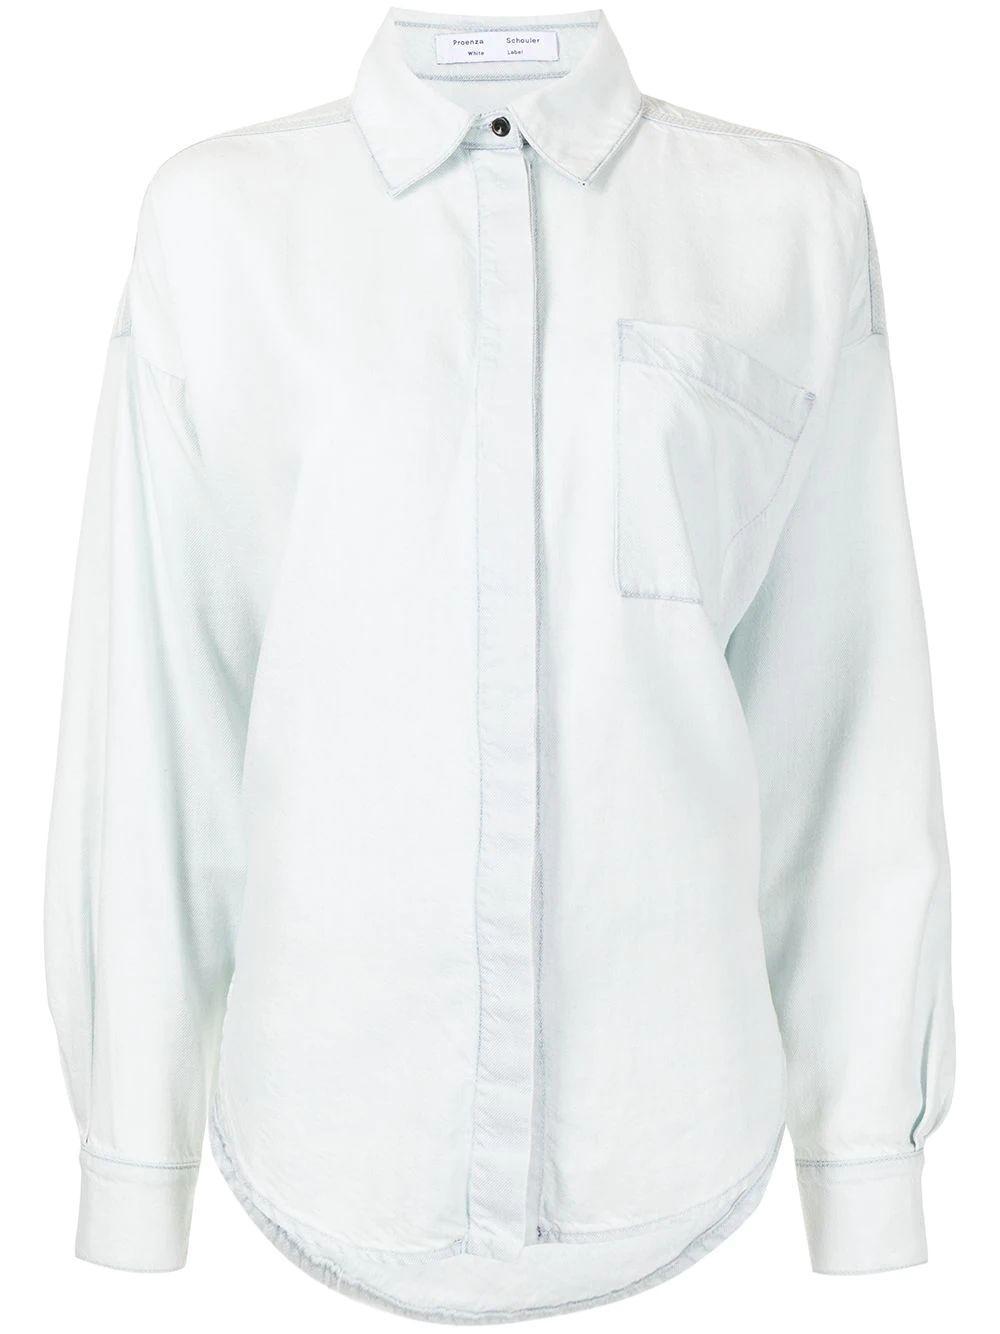 Chambray Shirt Item # WL2134229